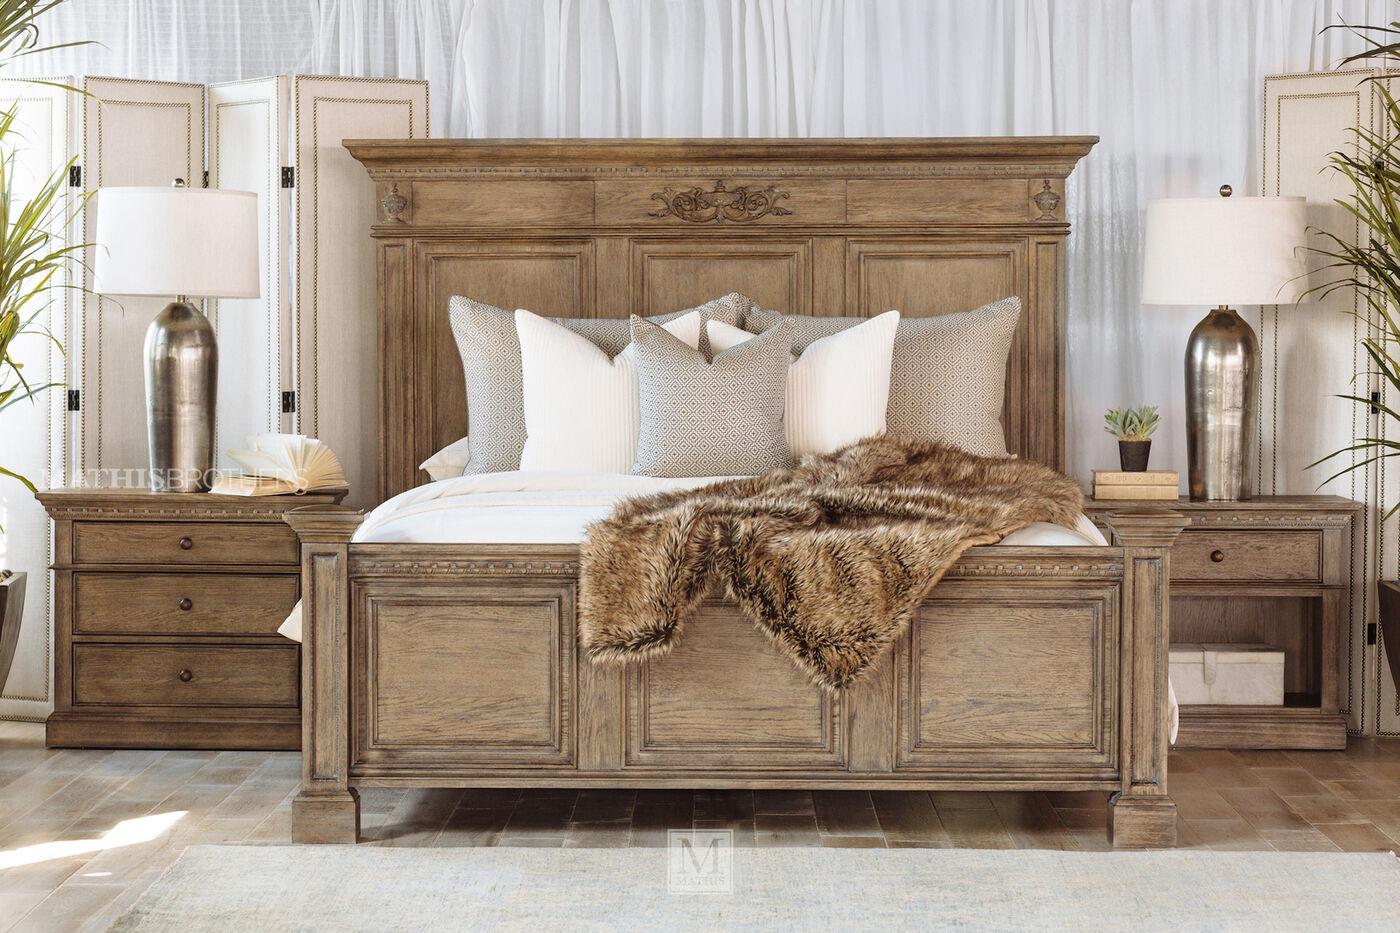 aspen oak bedroom furniture aspen bedroom furniture aspen oak bedroom furniture aspen wood. Black Bedroom Furniture Sets. Home Design Ideas